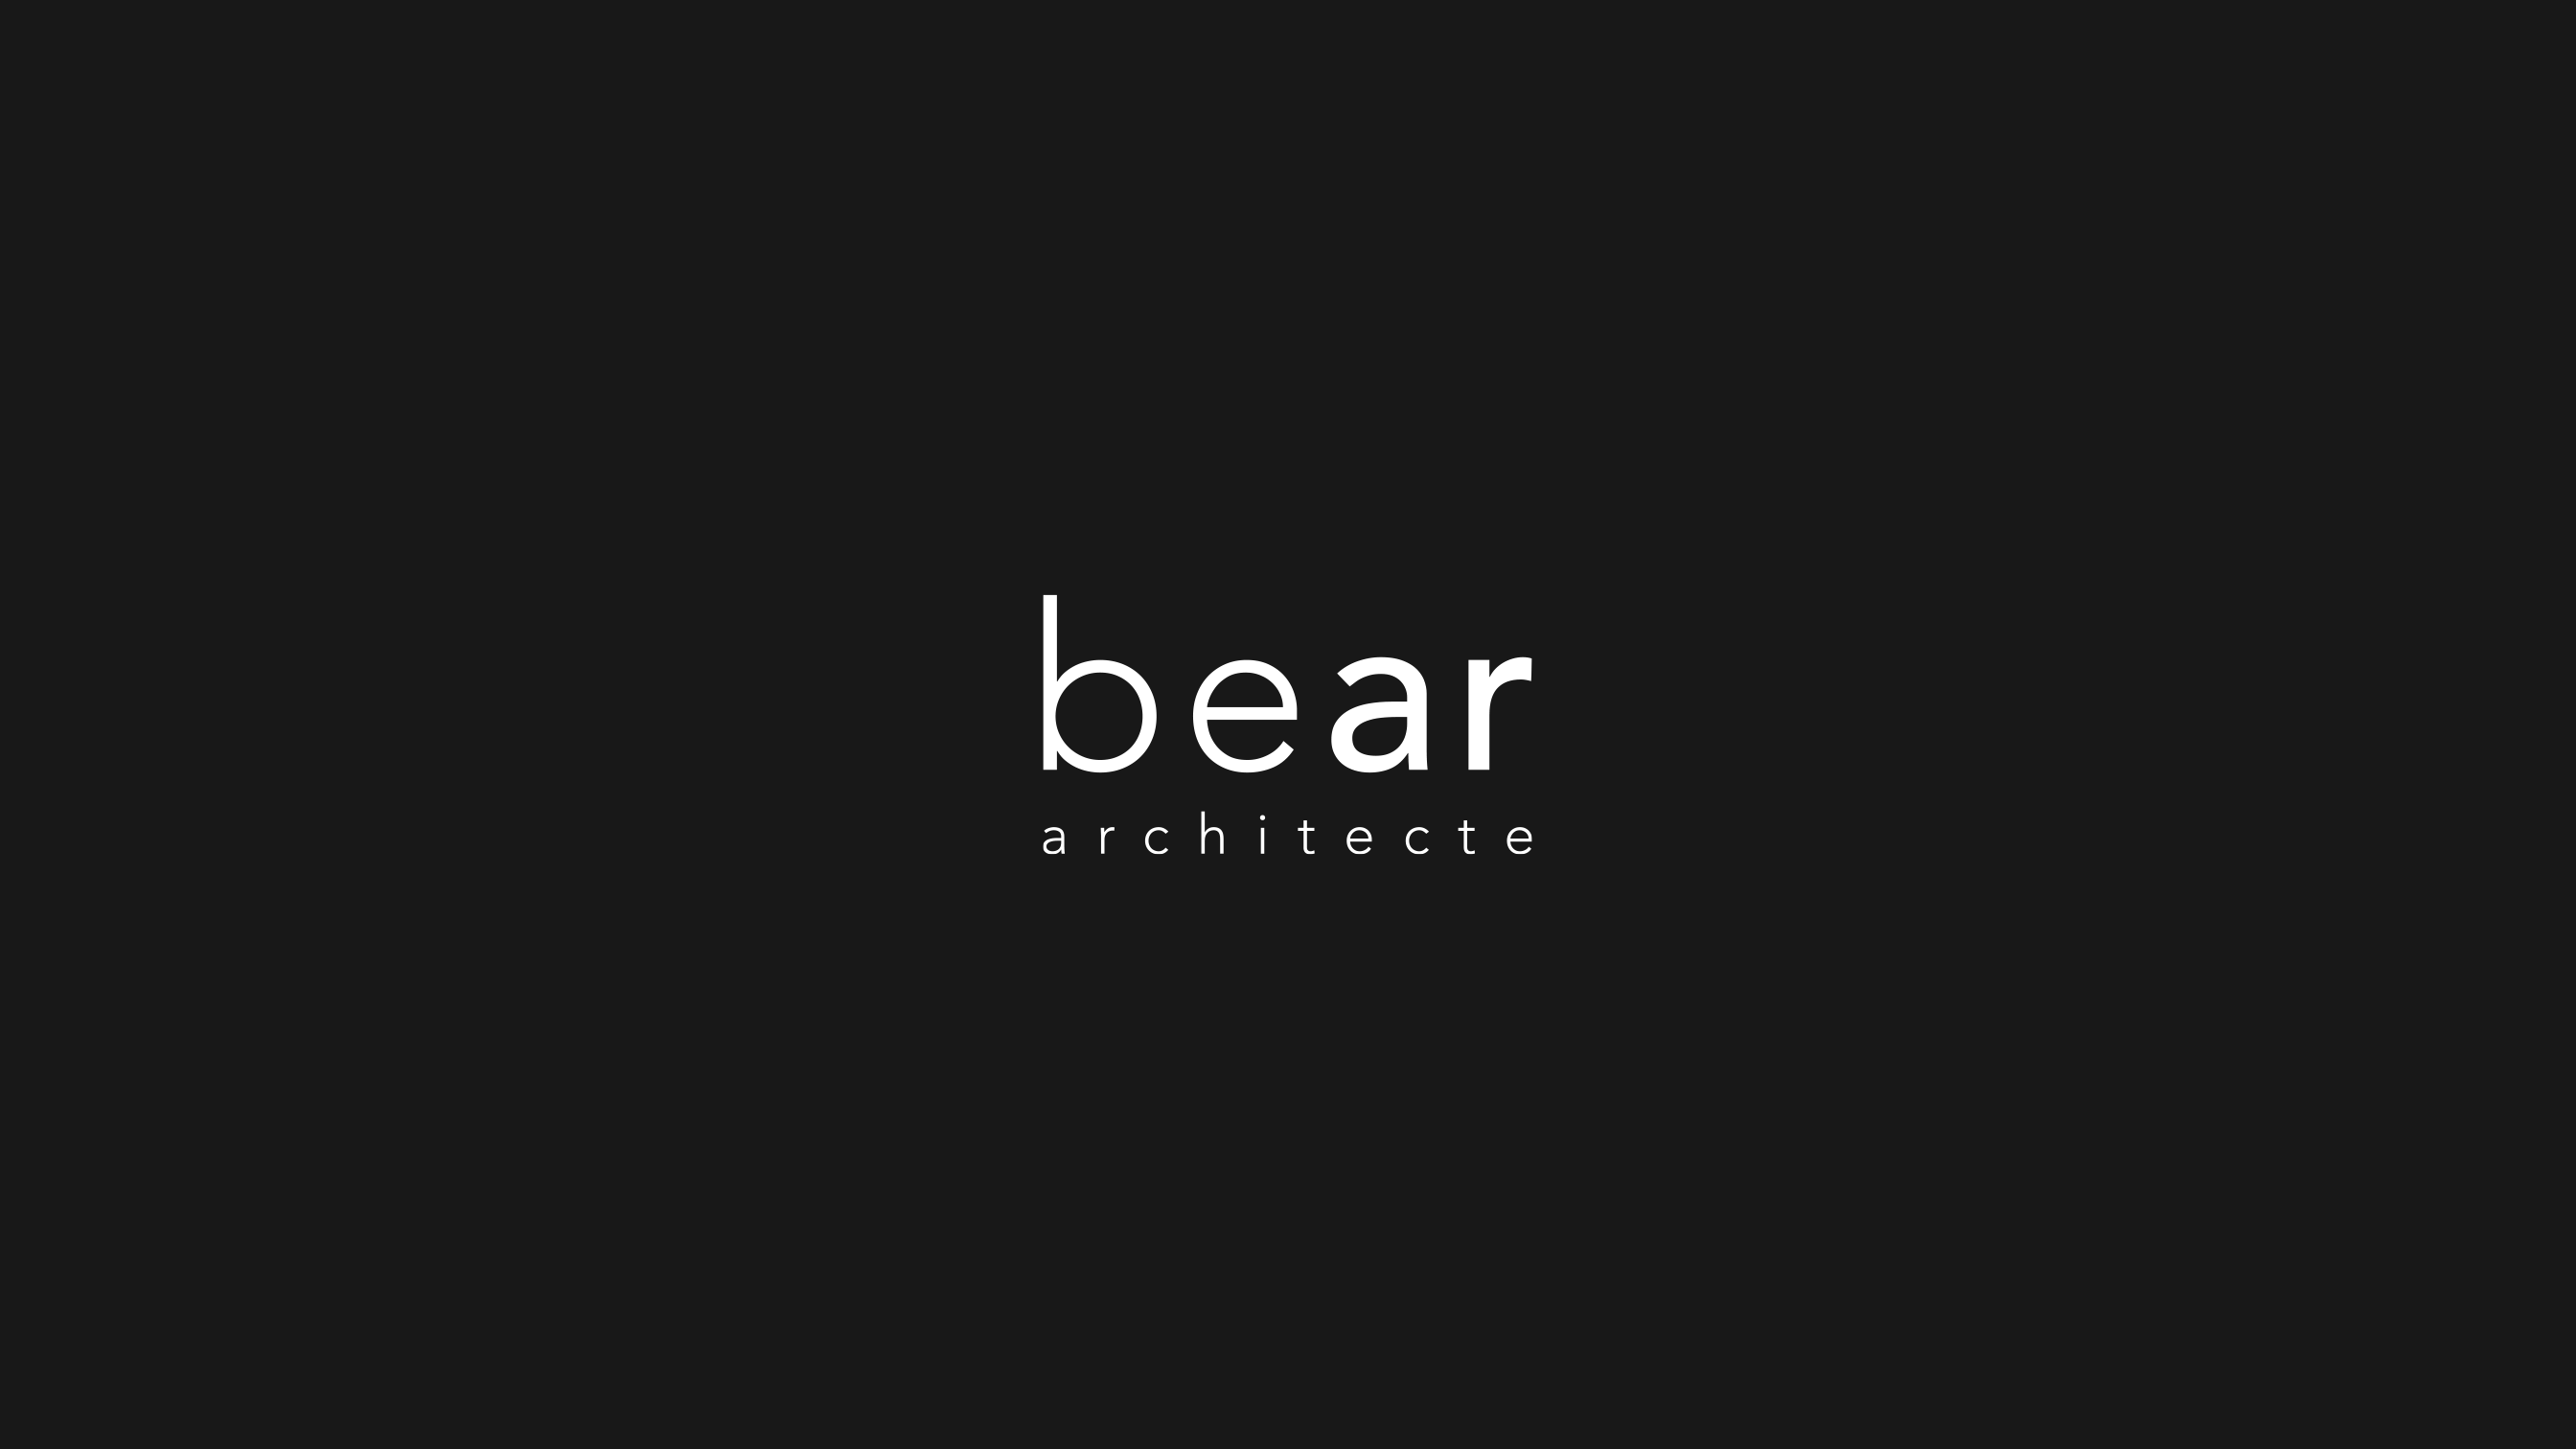 showcase-logotype-bear